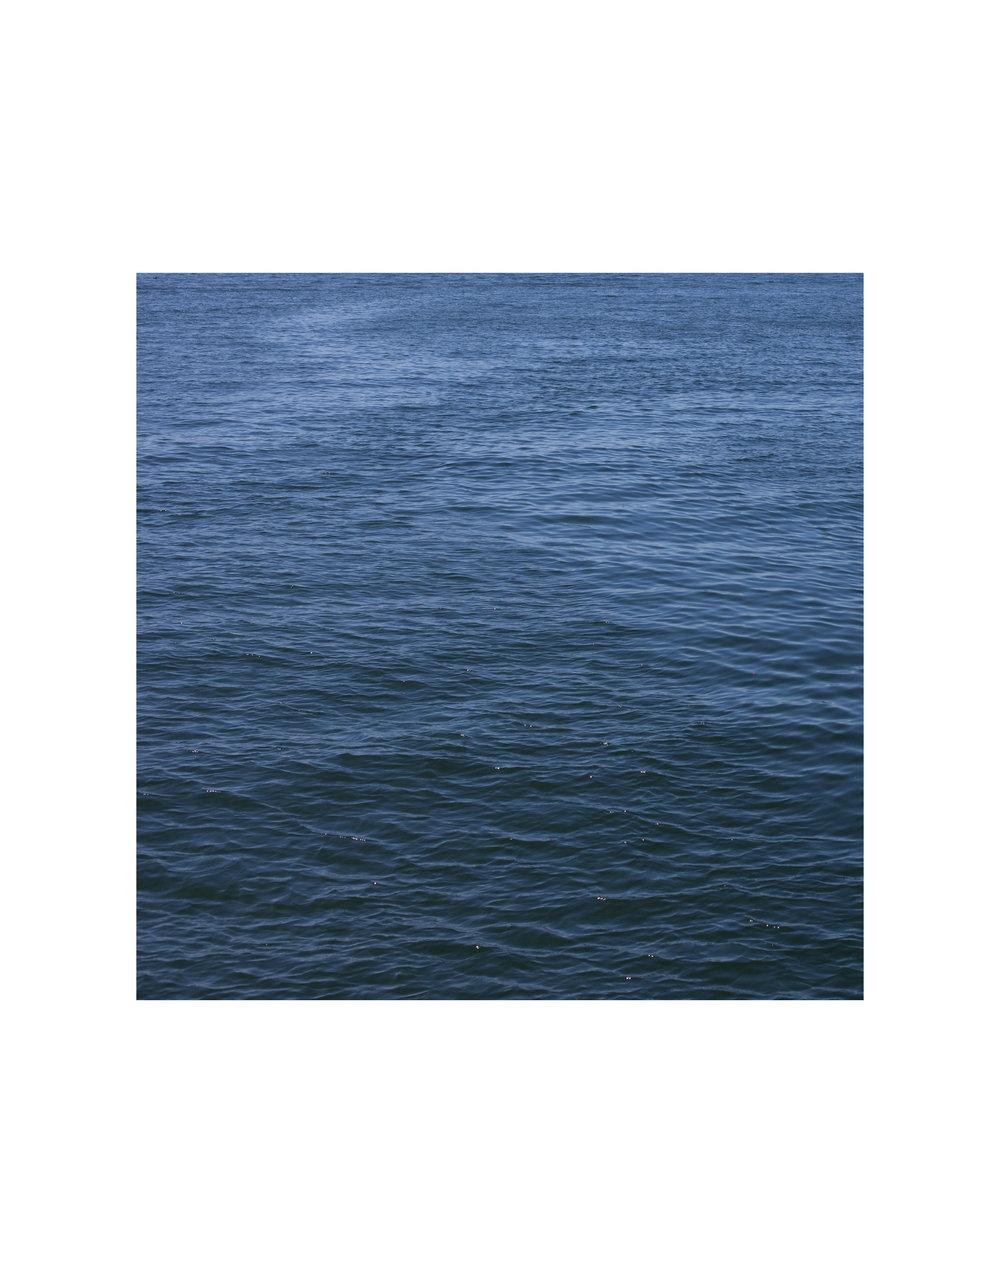 Puget Sound (2014)